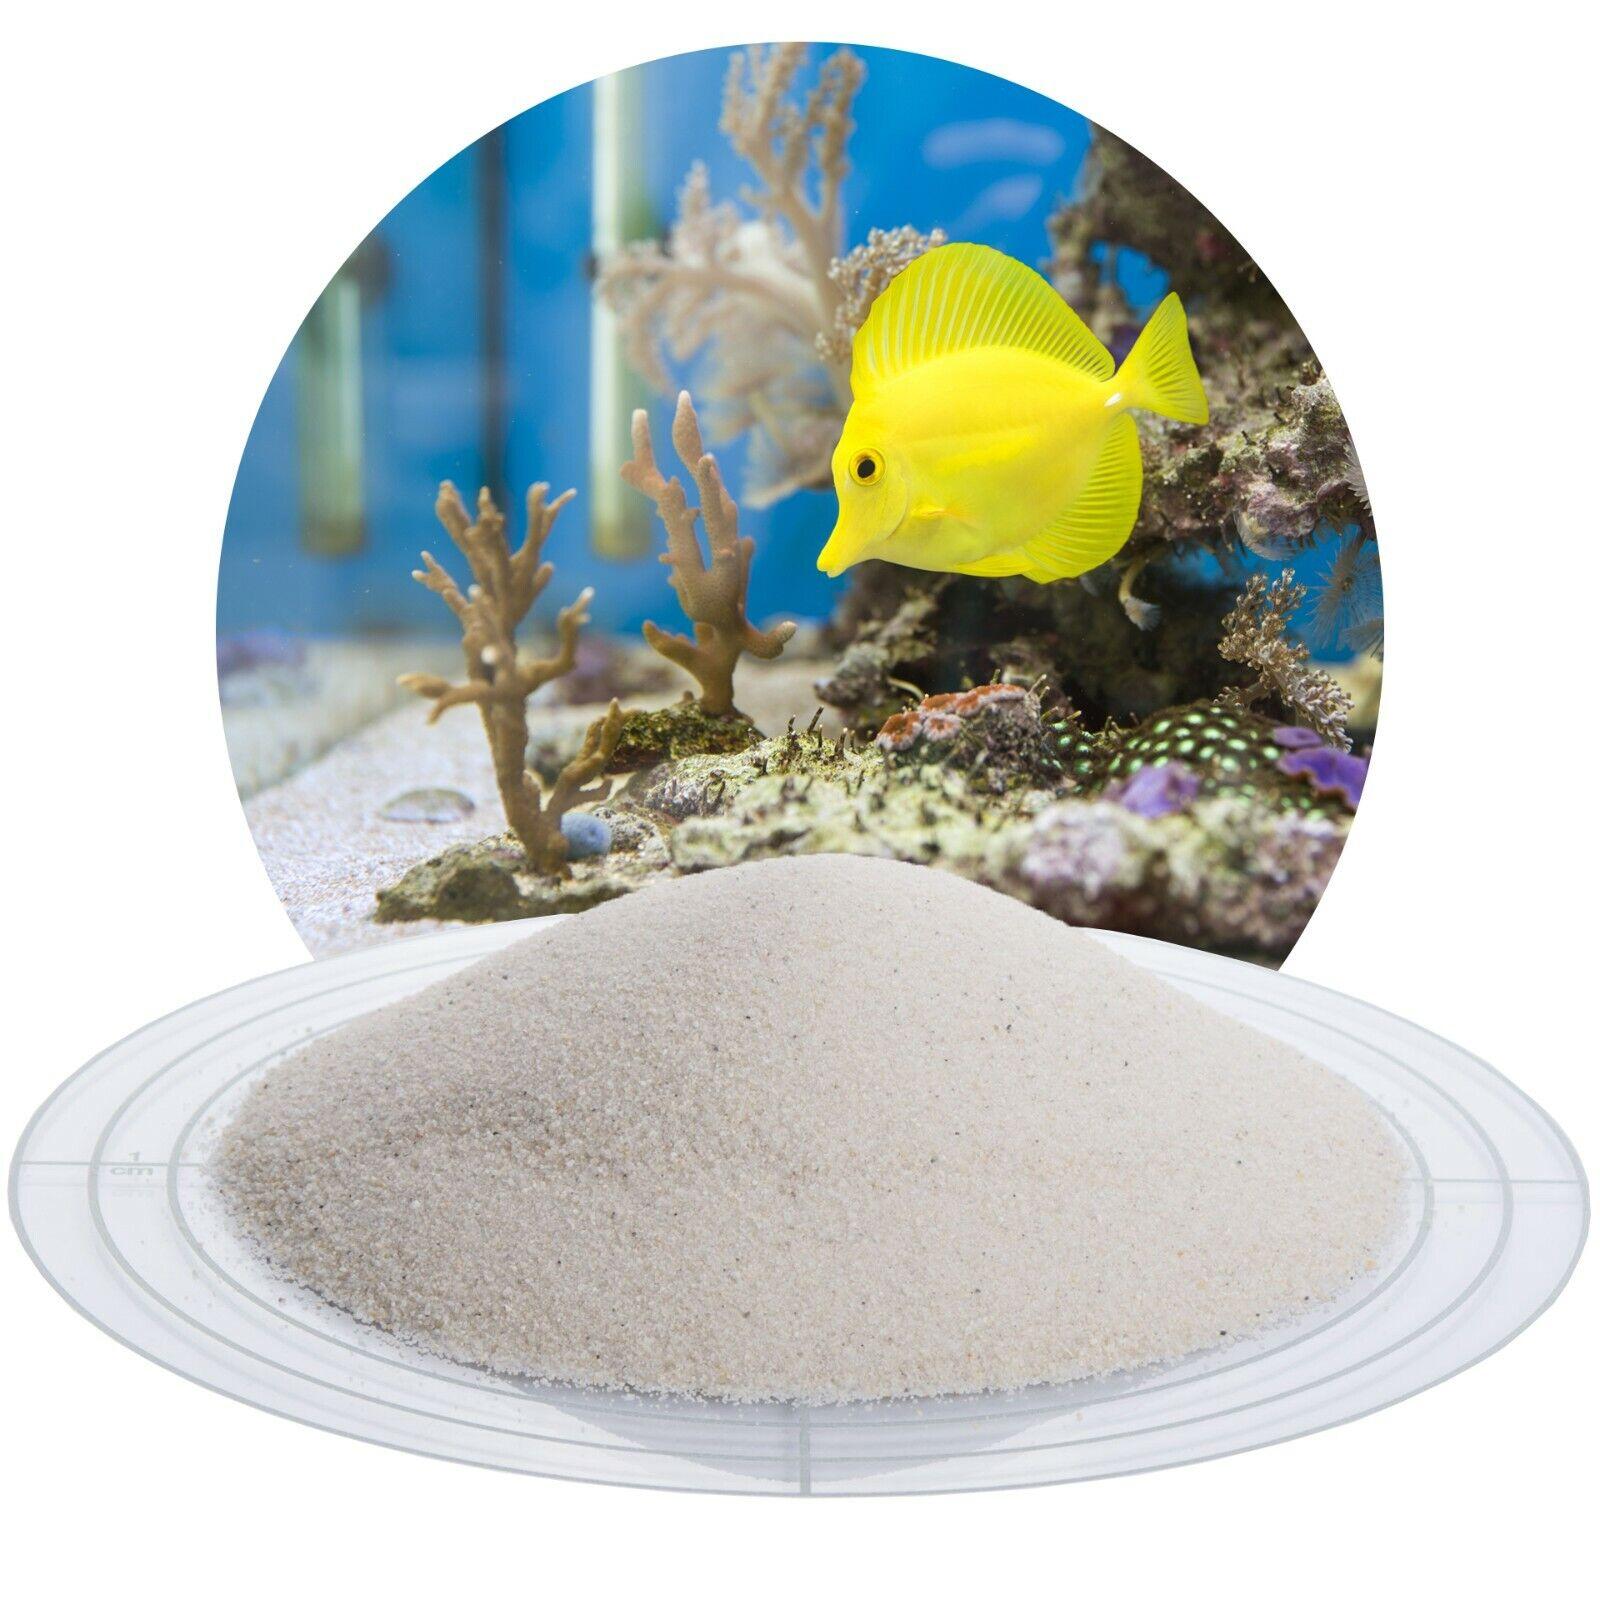 (0,64€/kg) 25 kg weißer Aquariumsand  Aquariensand Aquariumkies Bodengrund